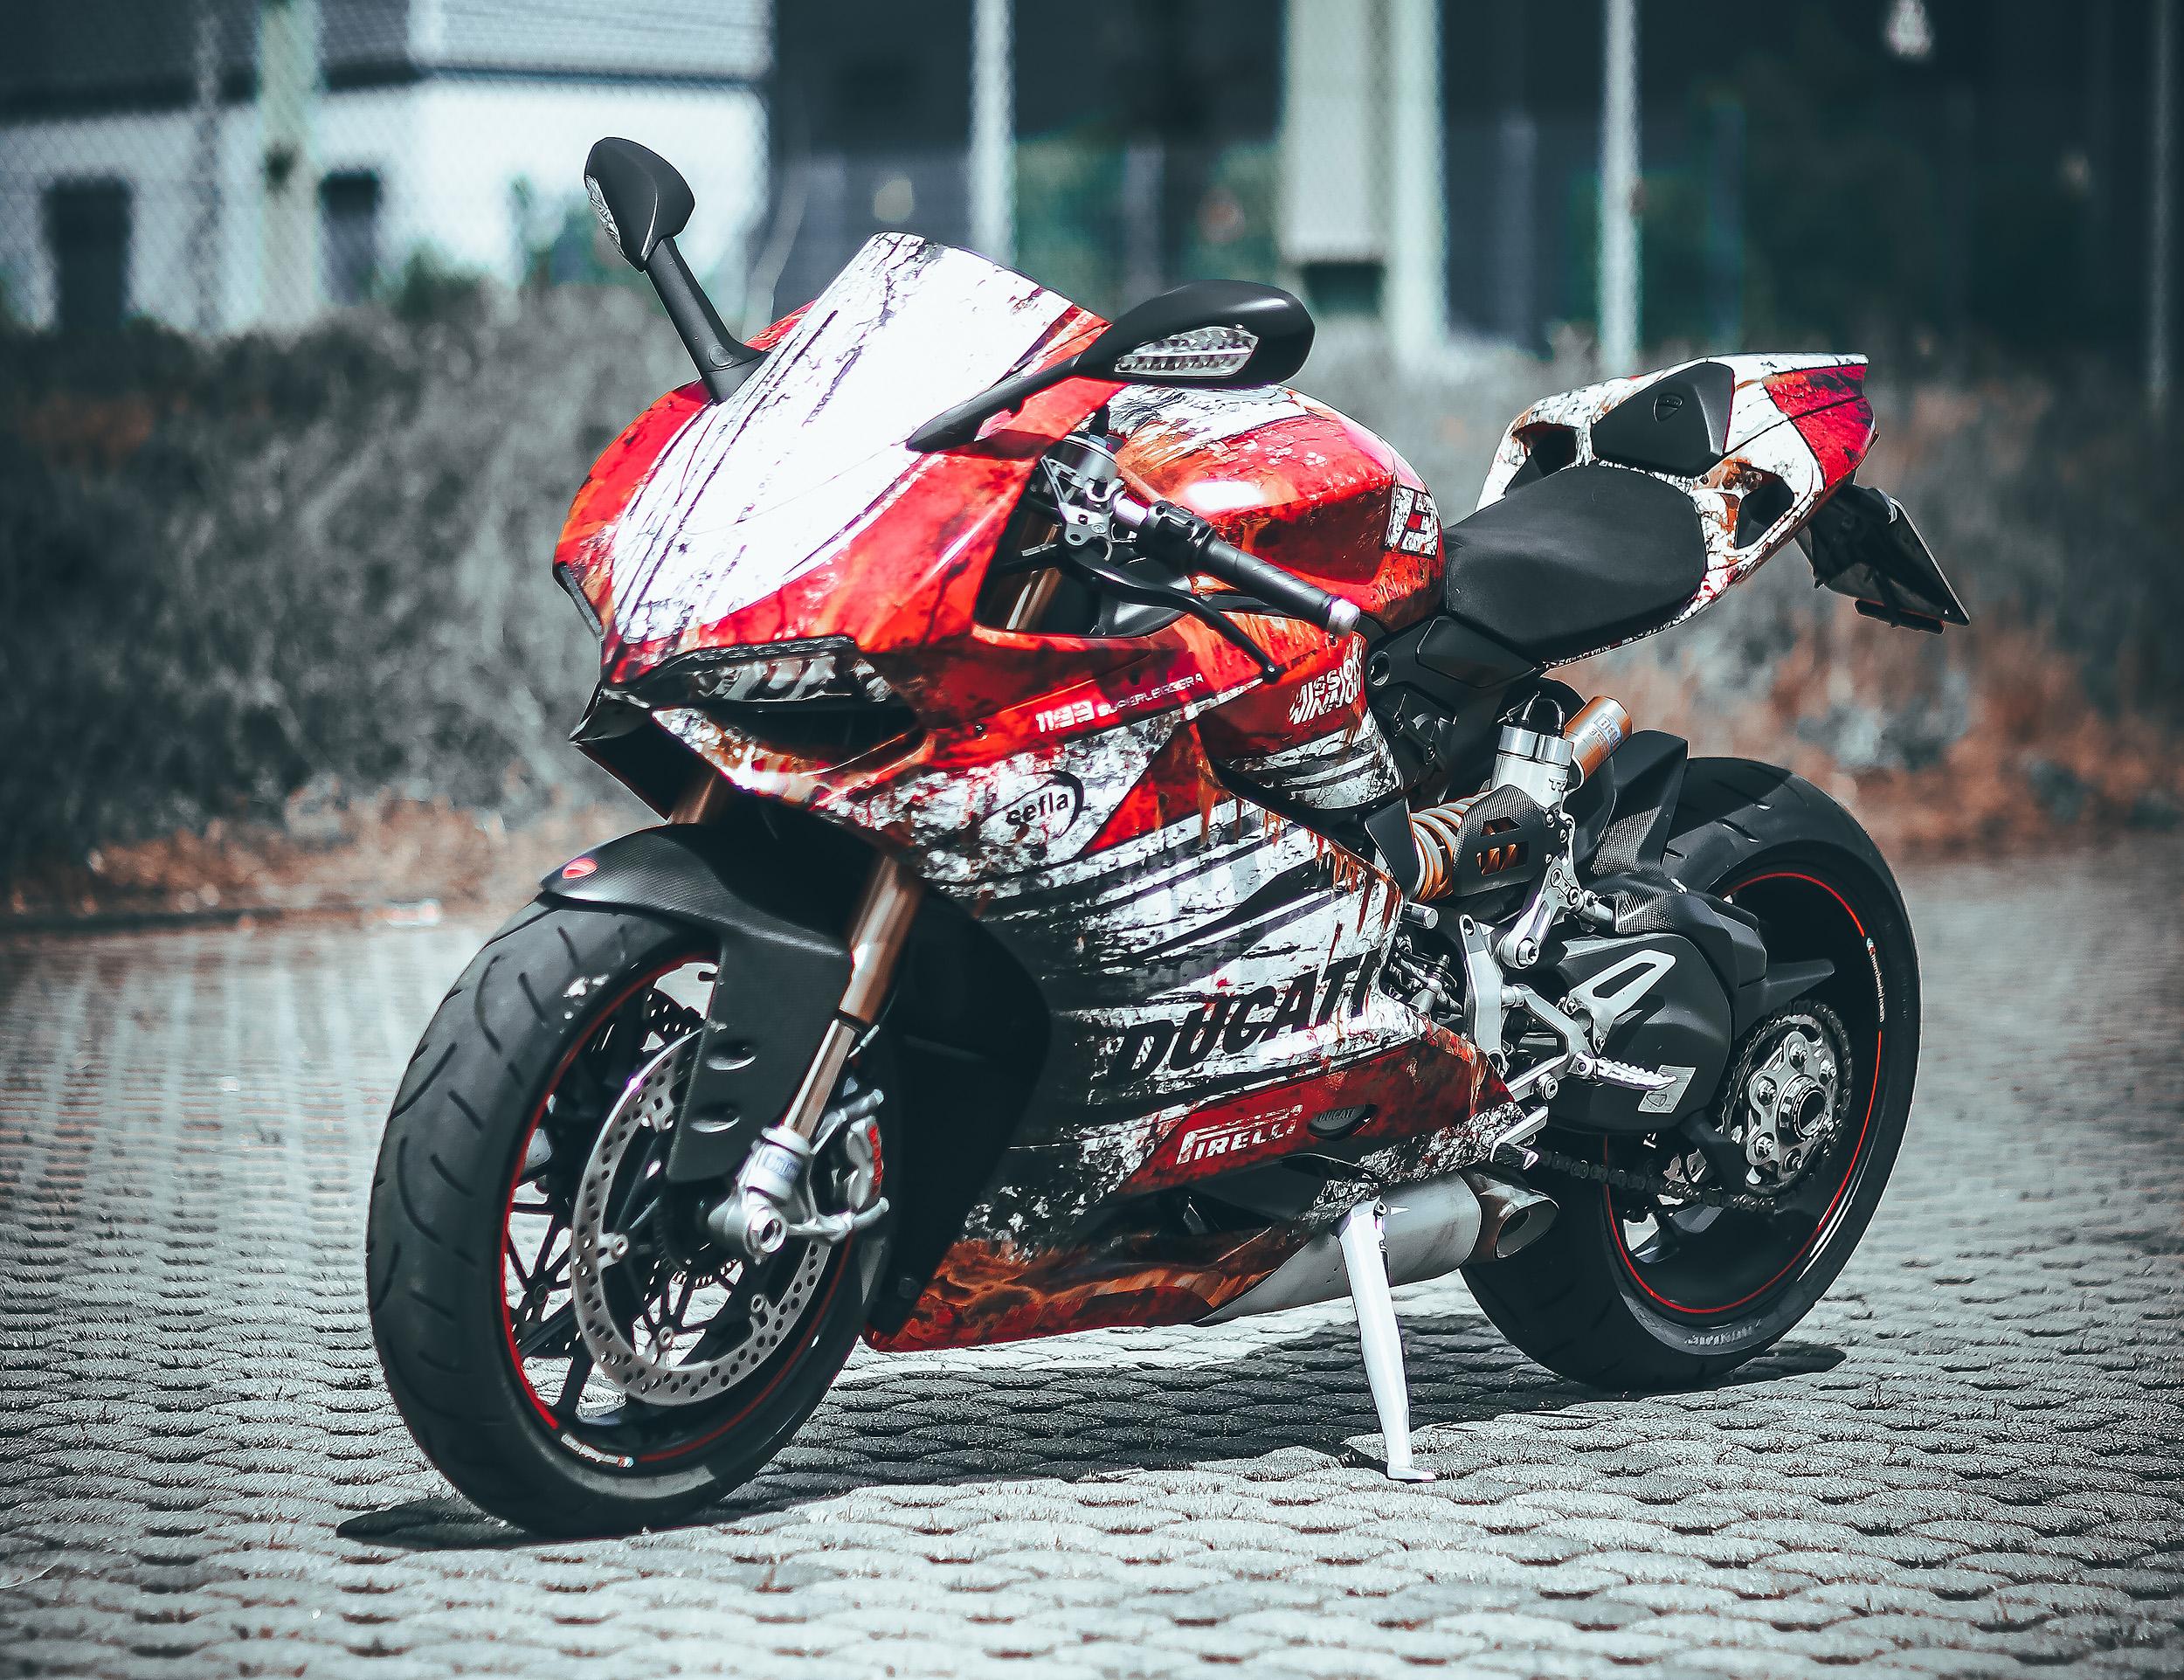 💥 Rusty Ducati livery 💥